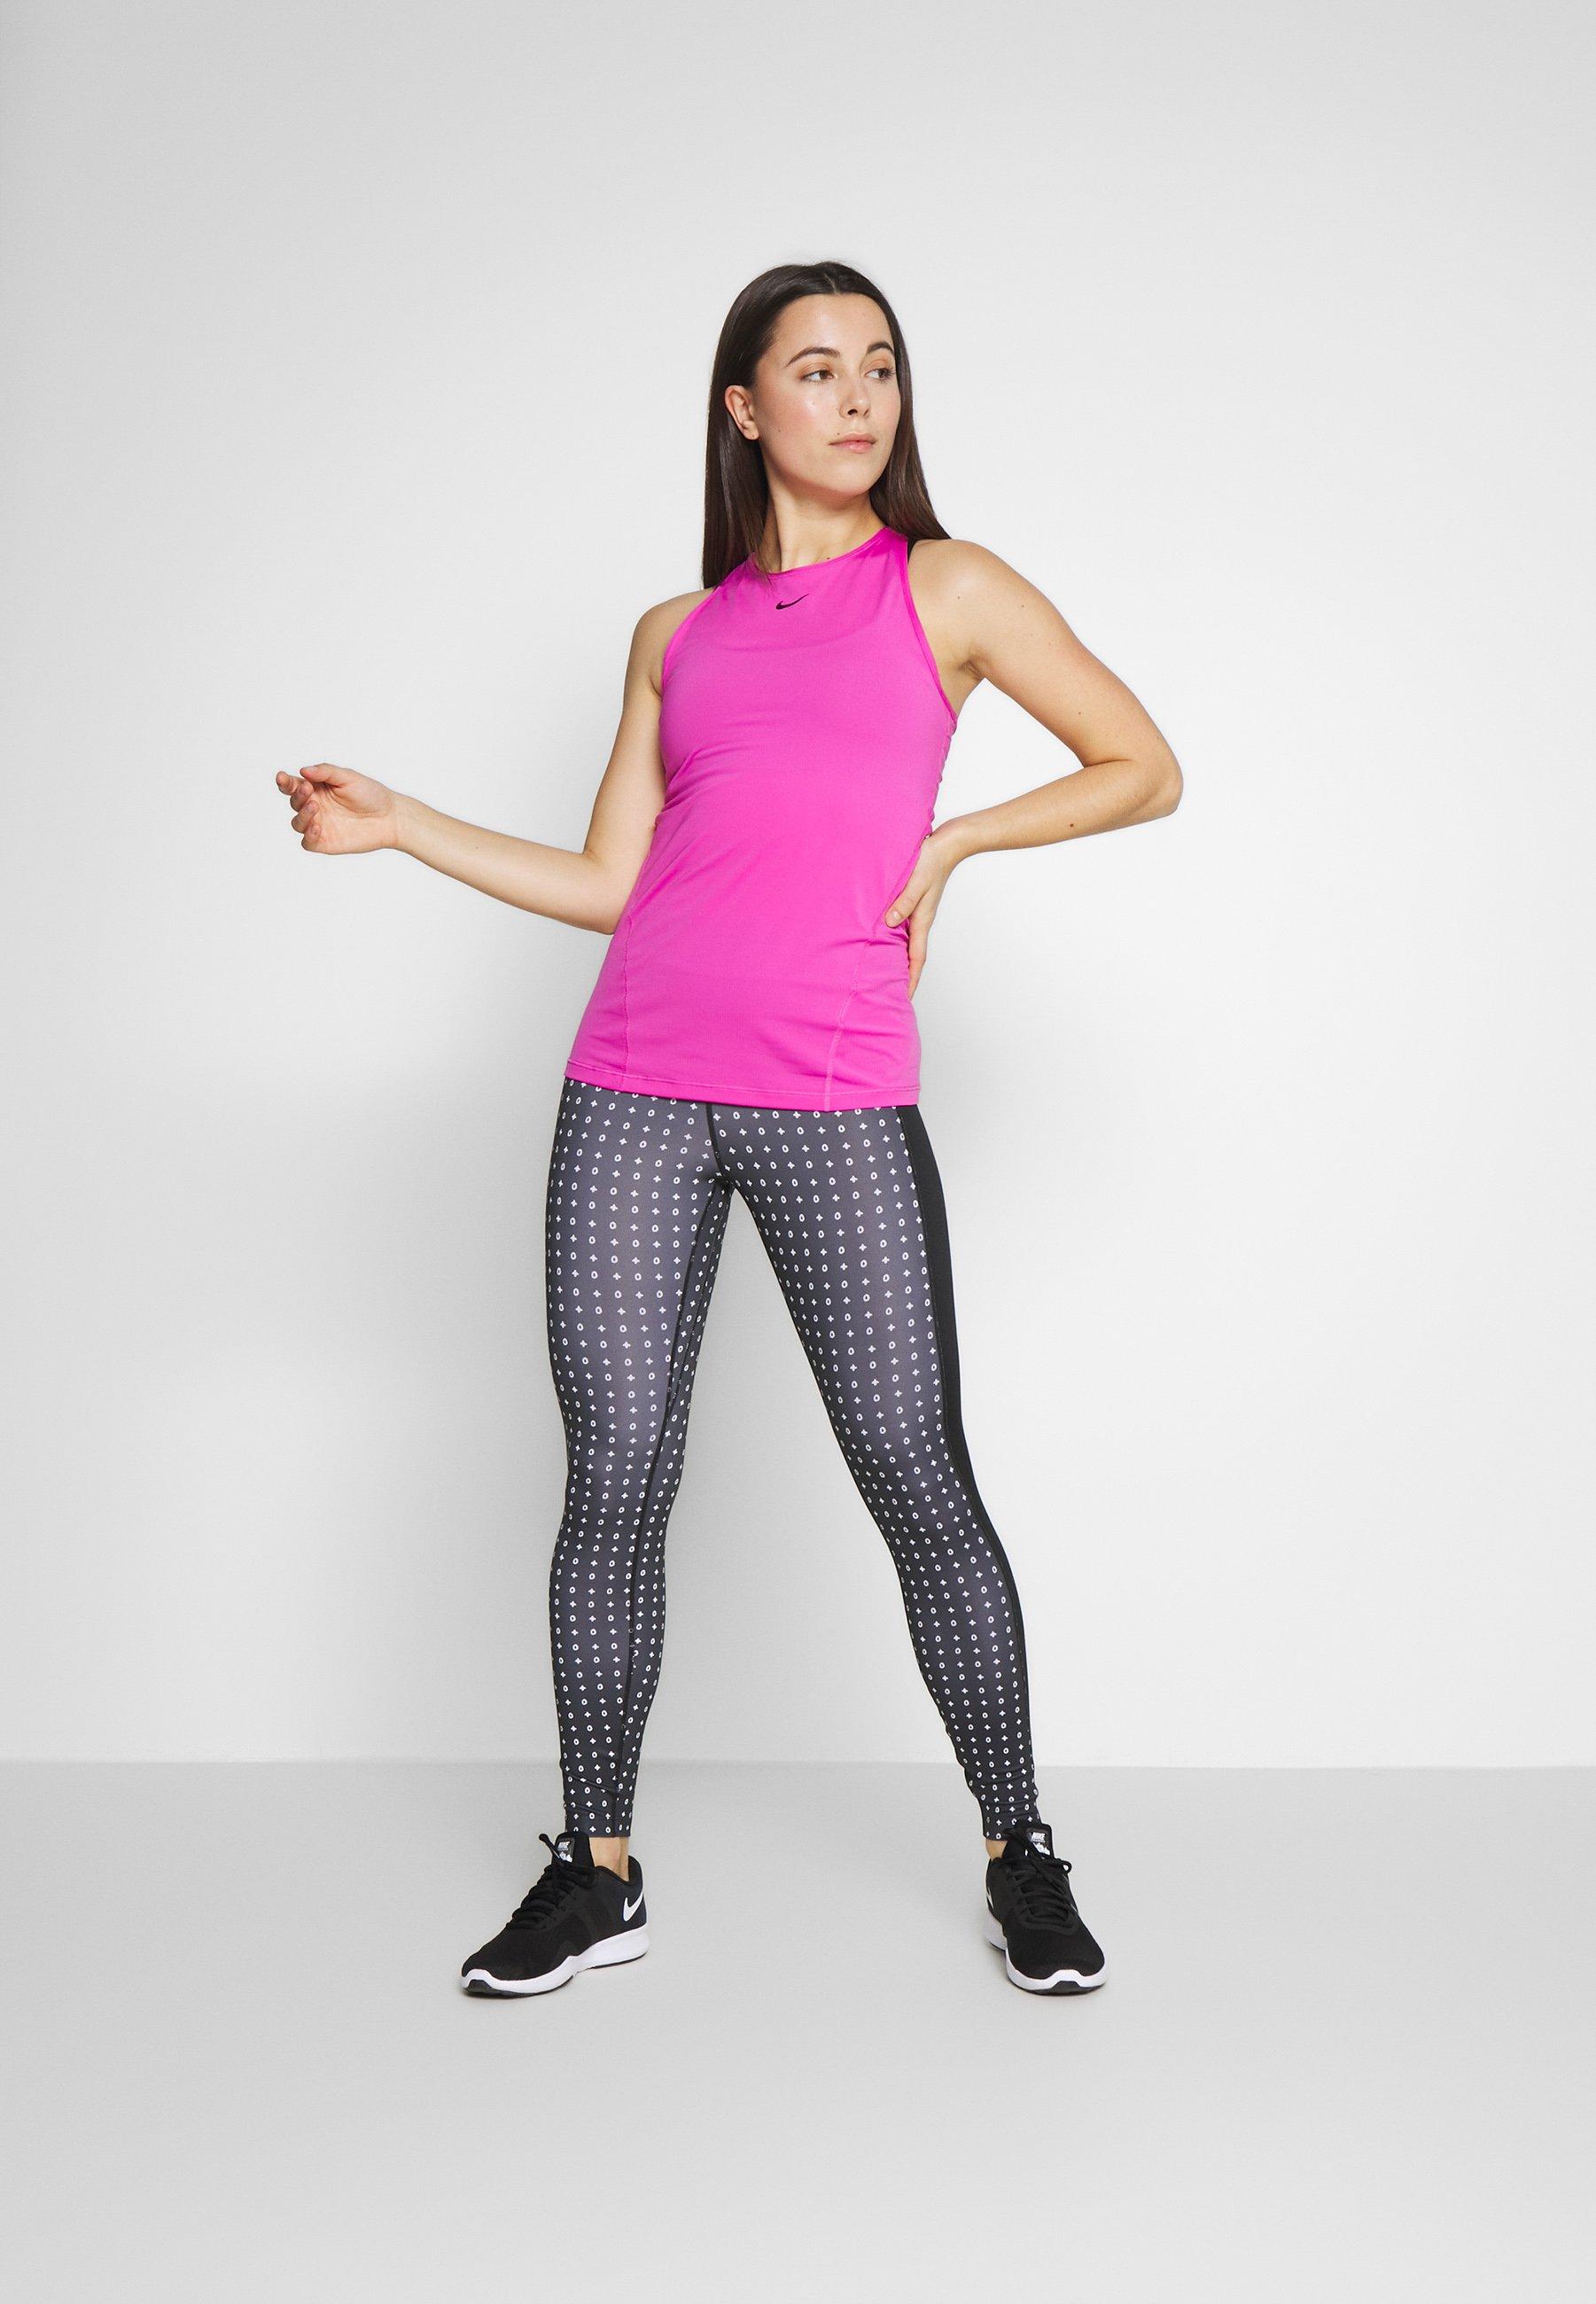 Nike Performance One - Leggings Black/white UK